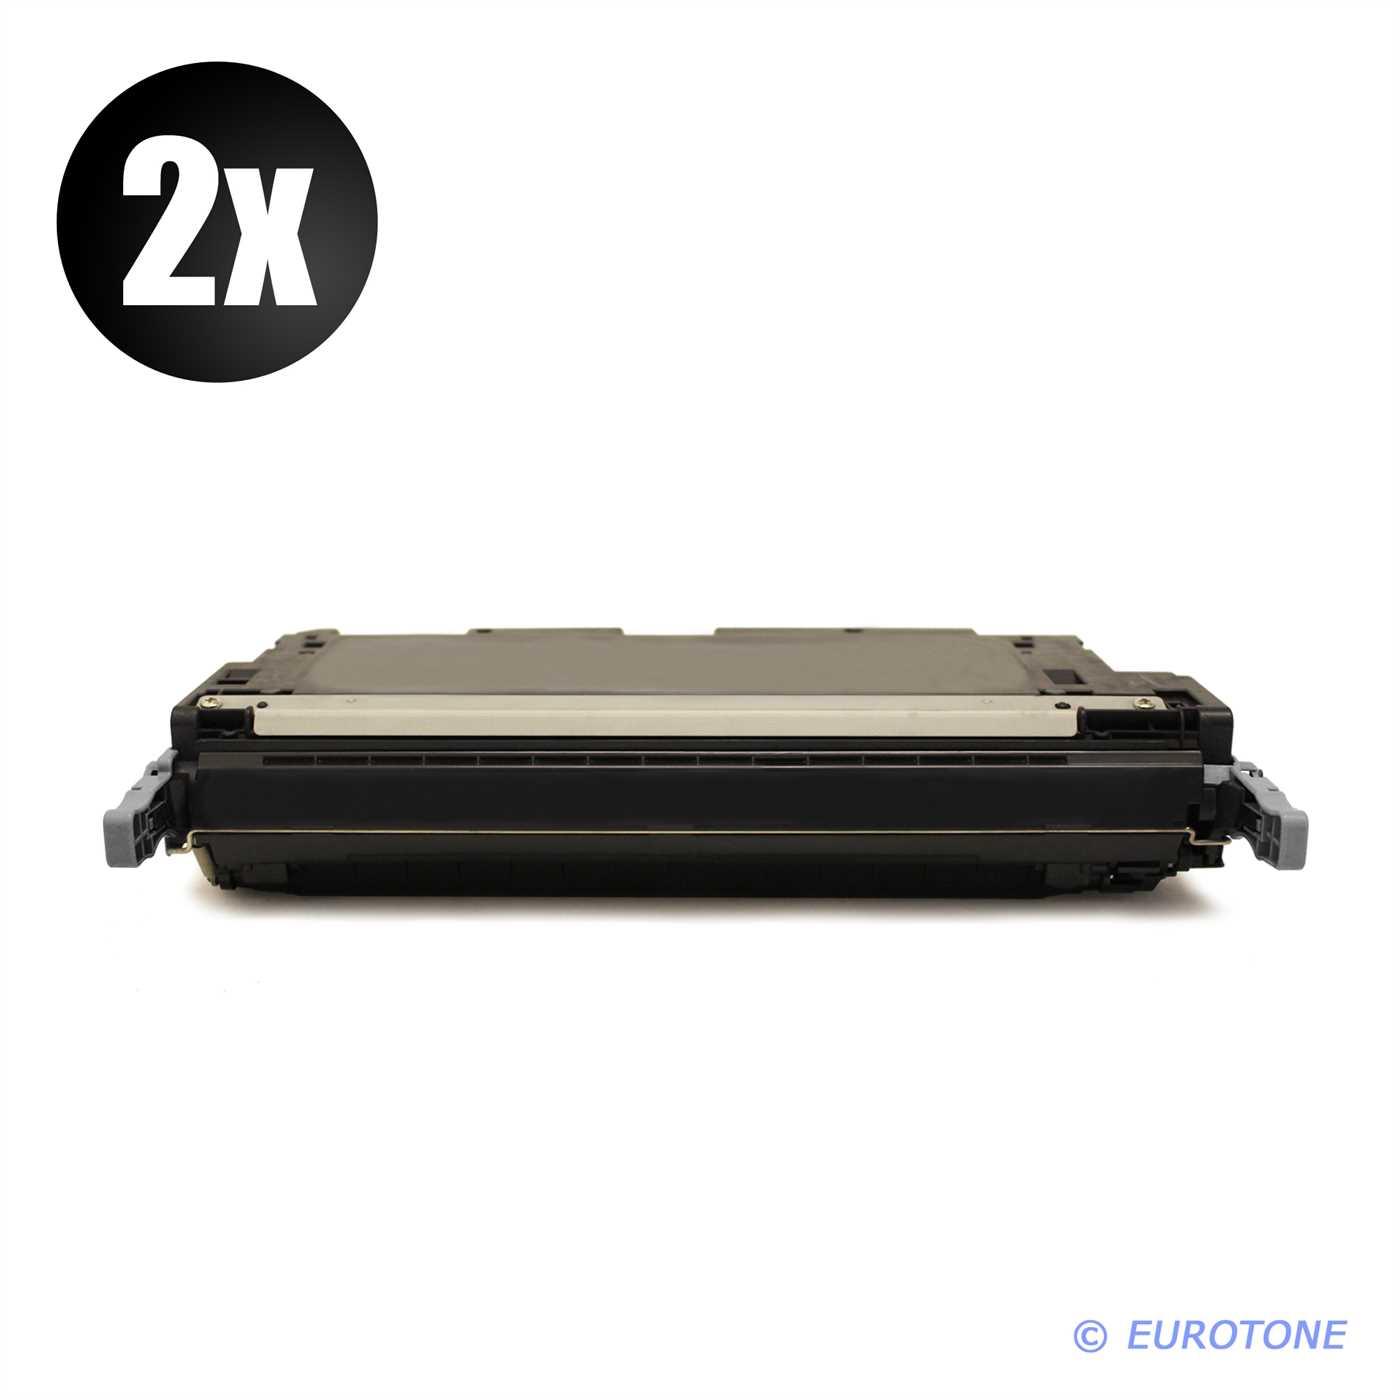 ECO Patrone BLACK für Canon I-Sensys MF-9220-cdn MF-9280-cdn MF-9130 MF-8450